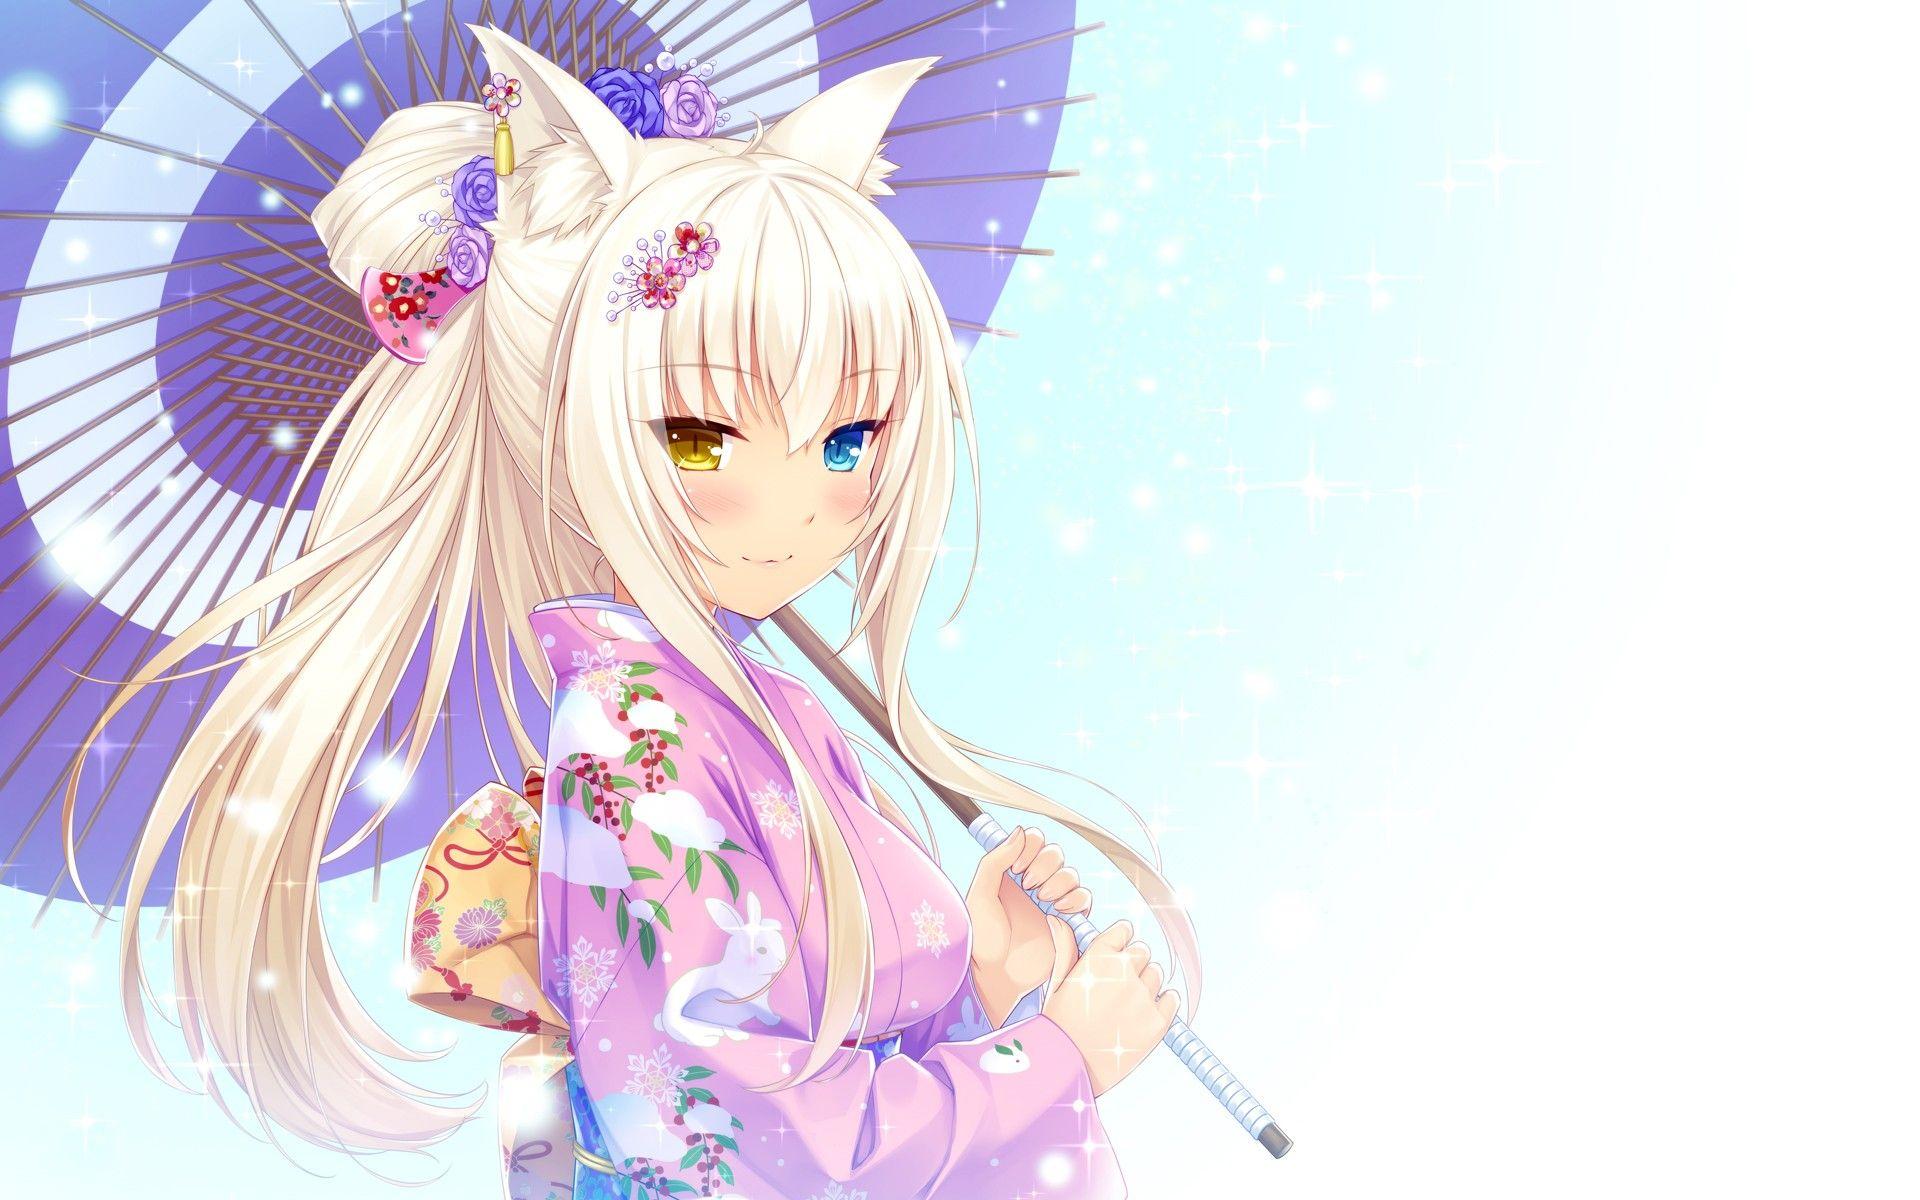 Anime anime girls anime cat girls umbrella Neko Para